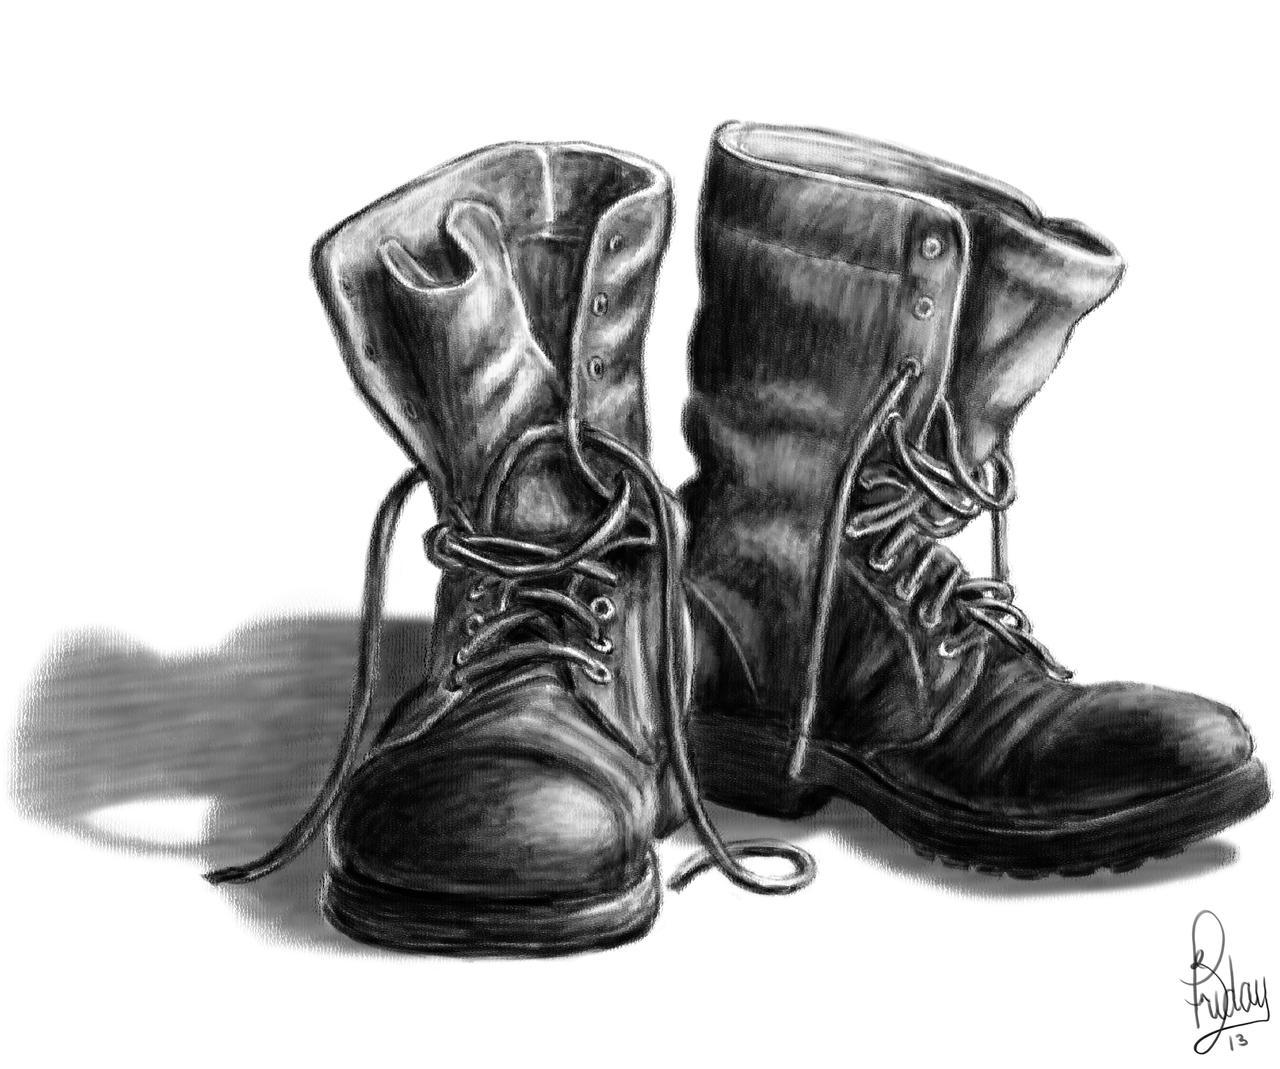 still boots by pixel slinger on deviantart